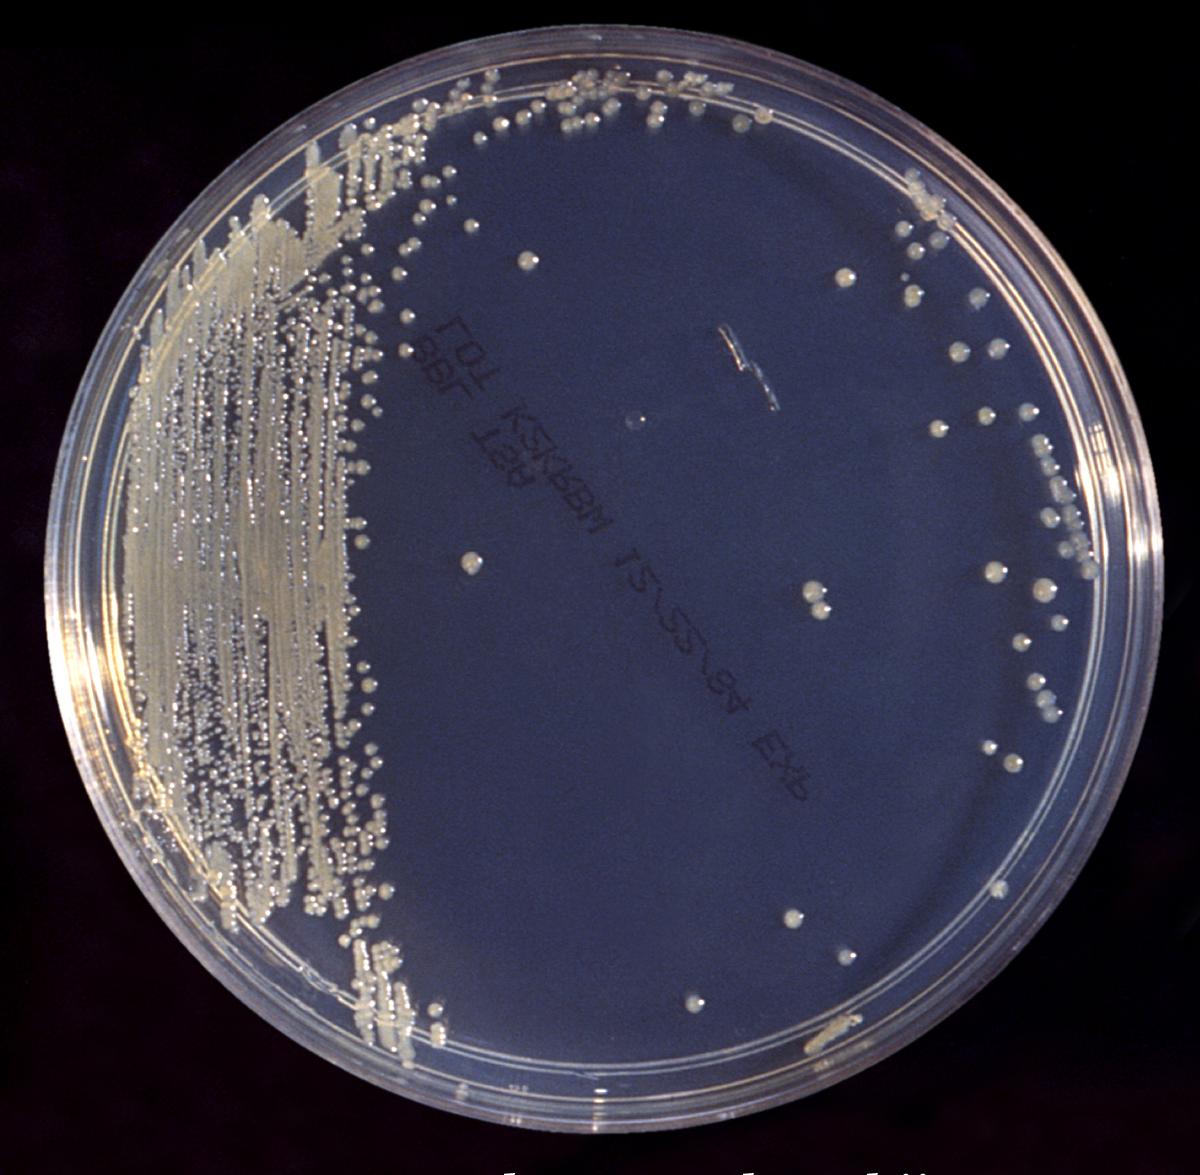 Image Result For Can Meningitis Spread